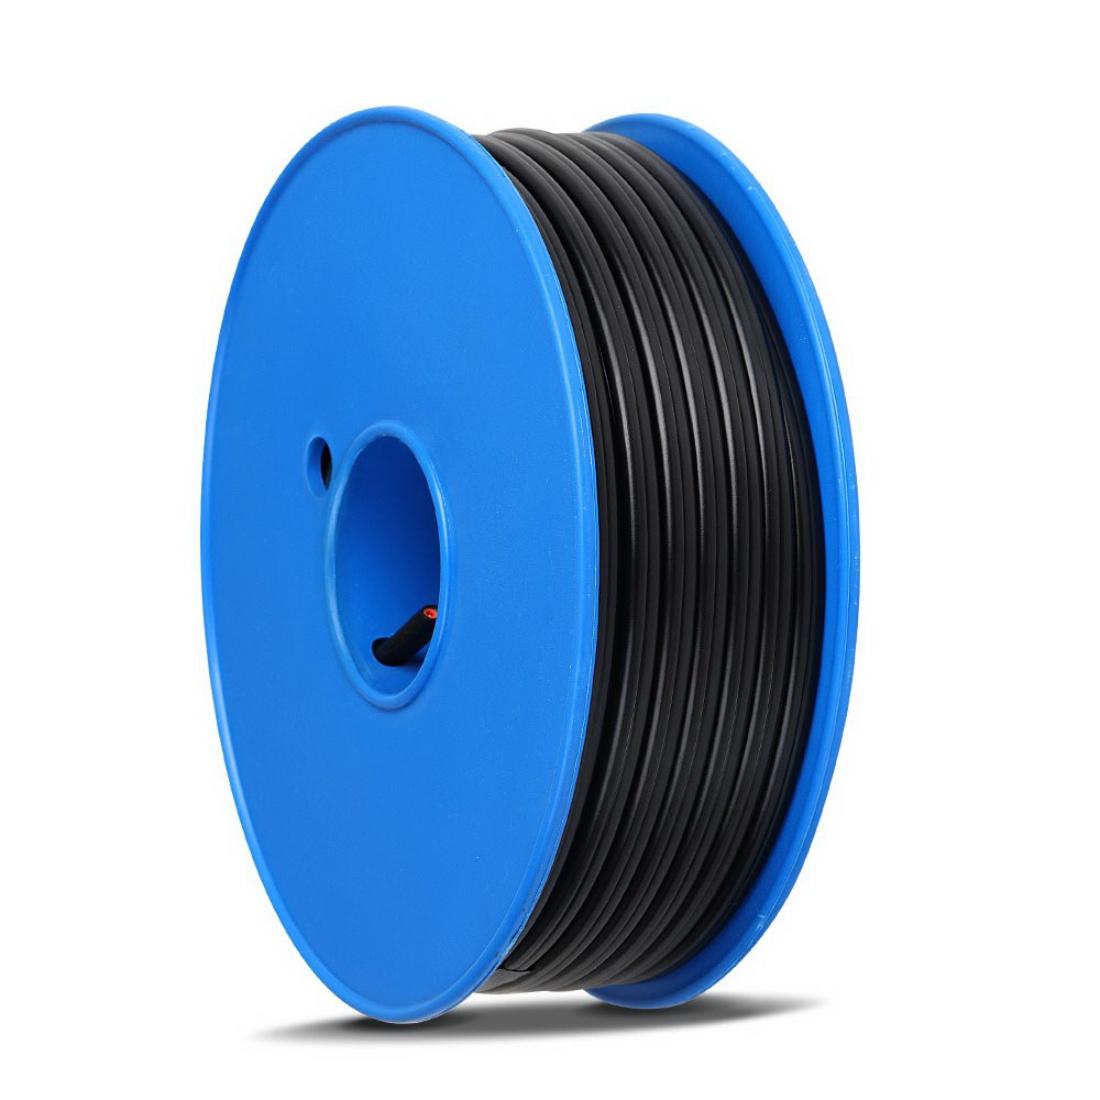 12V 3mm 30 Metre Long Solar Installation Cable